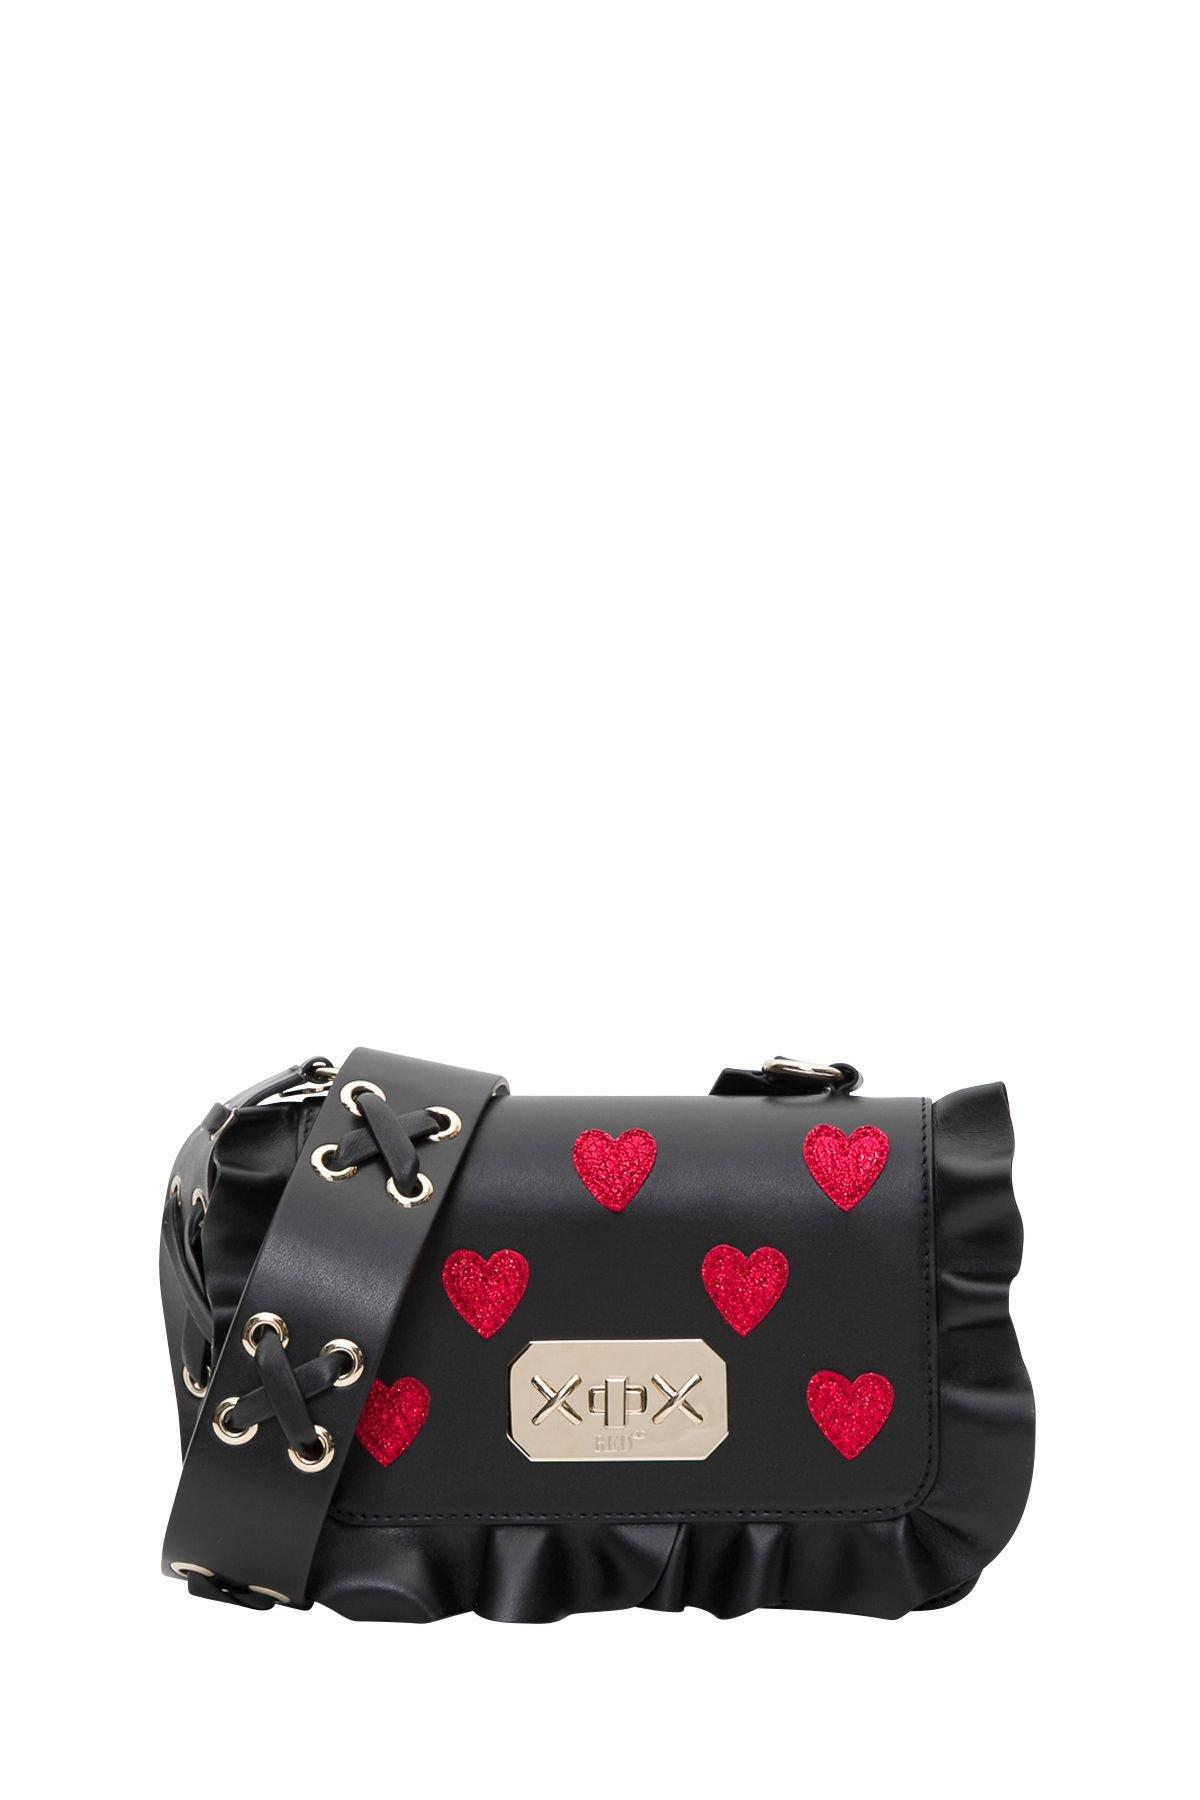 RED Valentino Rock Ruffles Crossbody Bag With Glitter Hearts